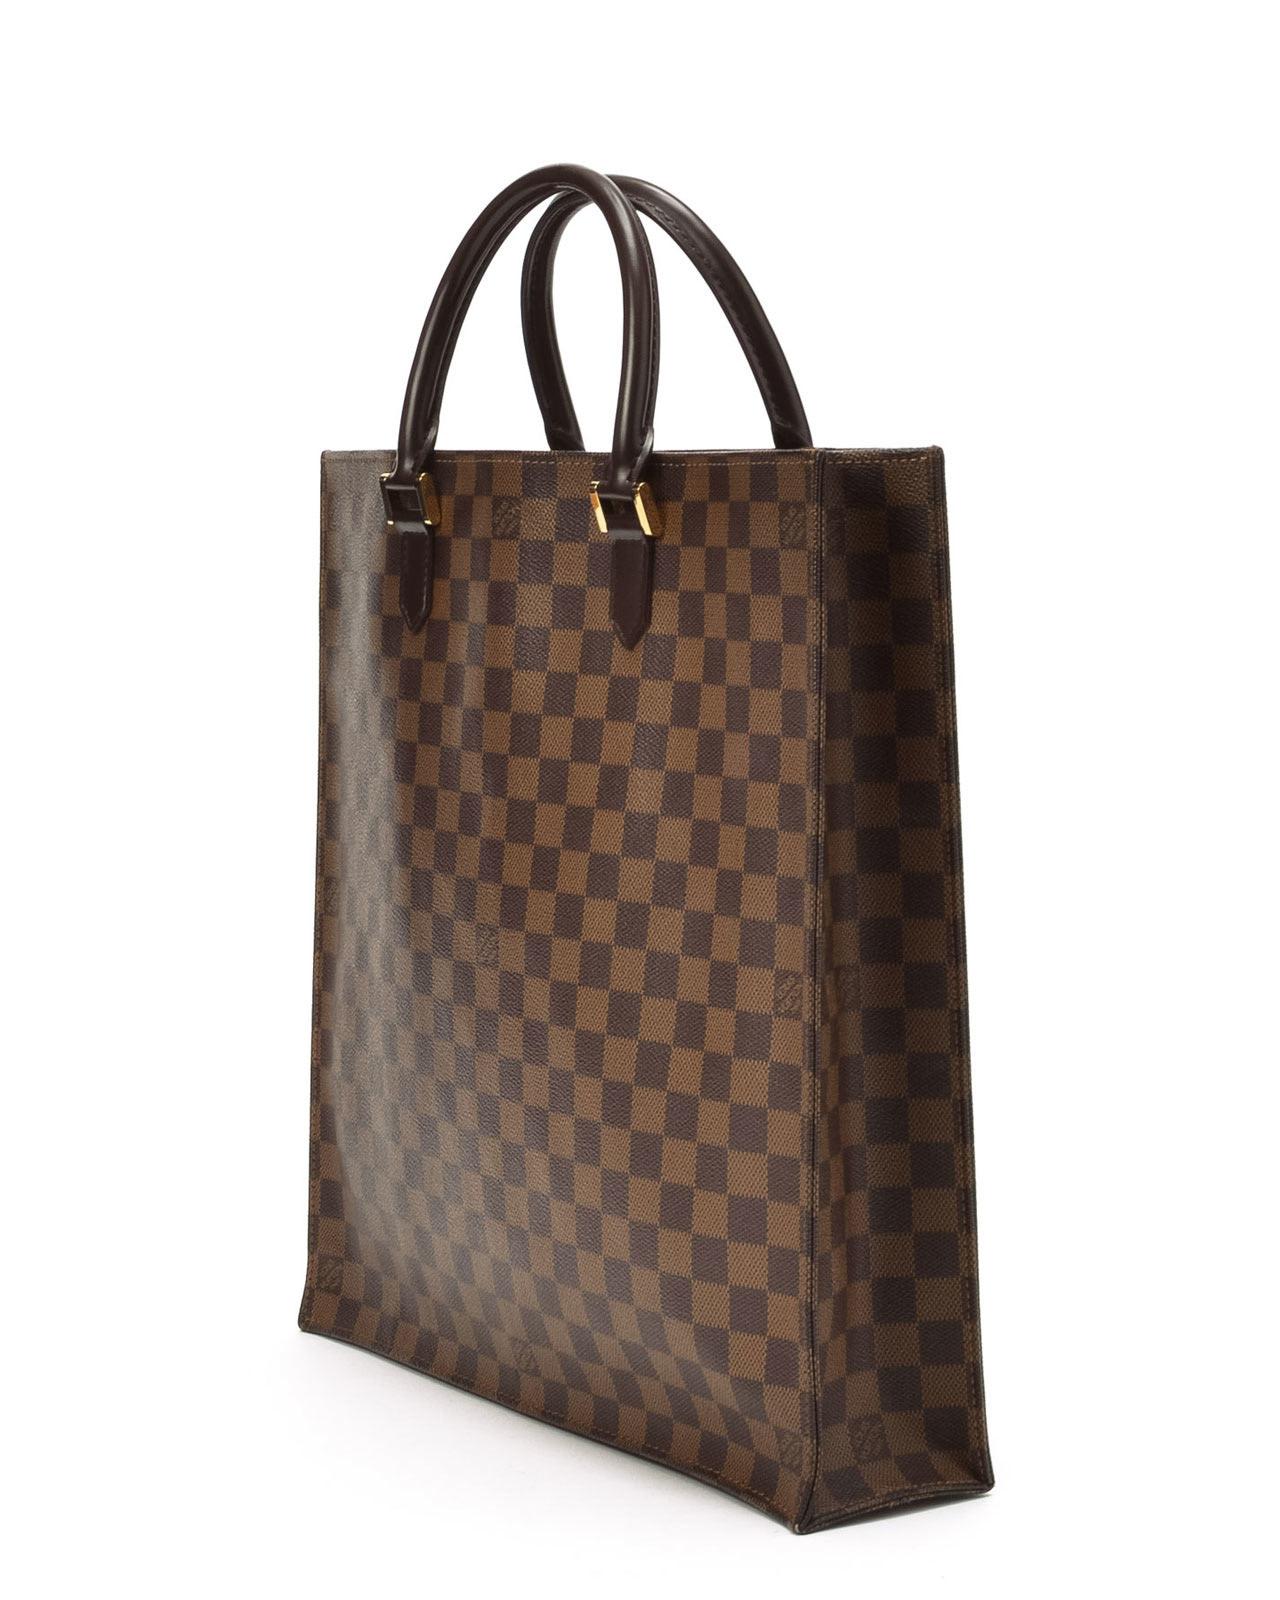 4d23335d58ad Lyst - Louis Vuitton Damier Ebene Sac Plat Handbag in Green